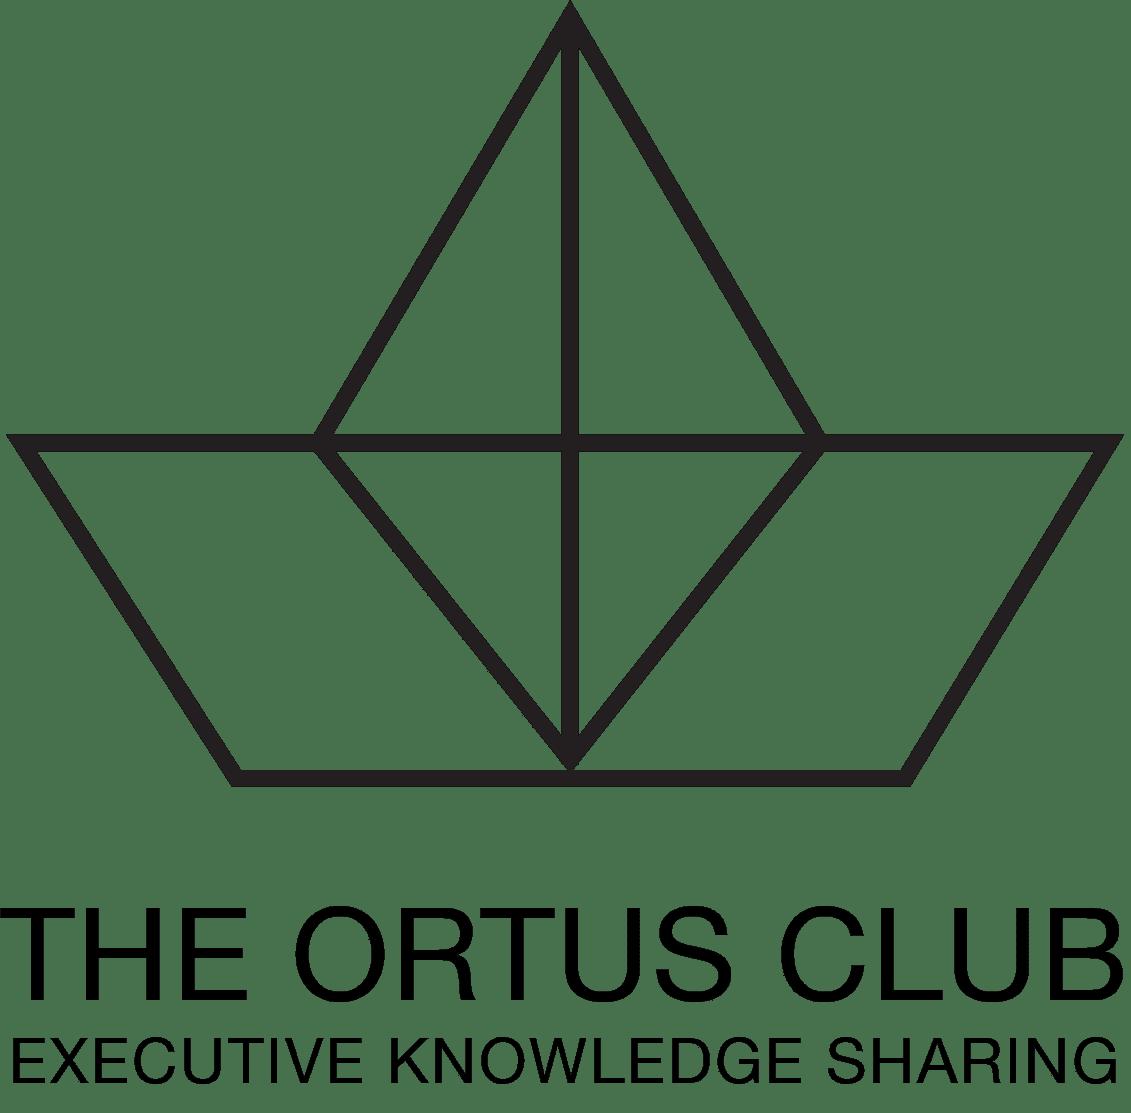 OrtusClub